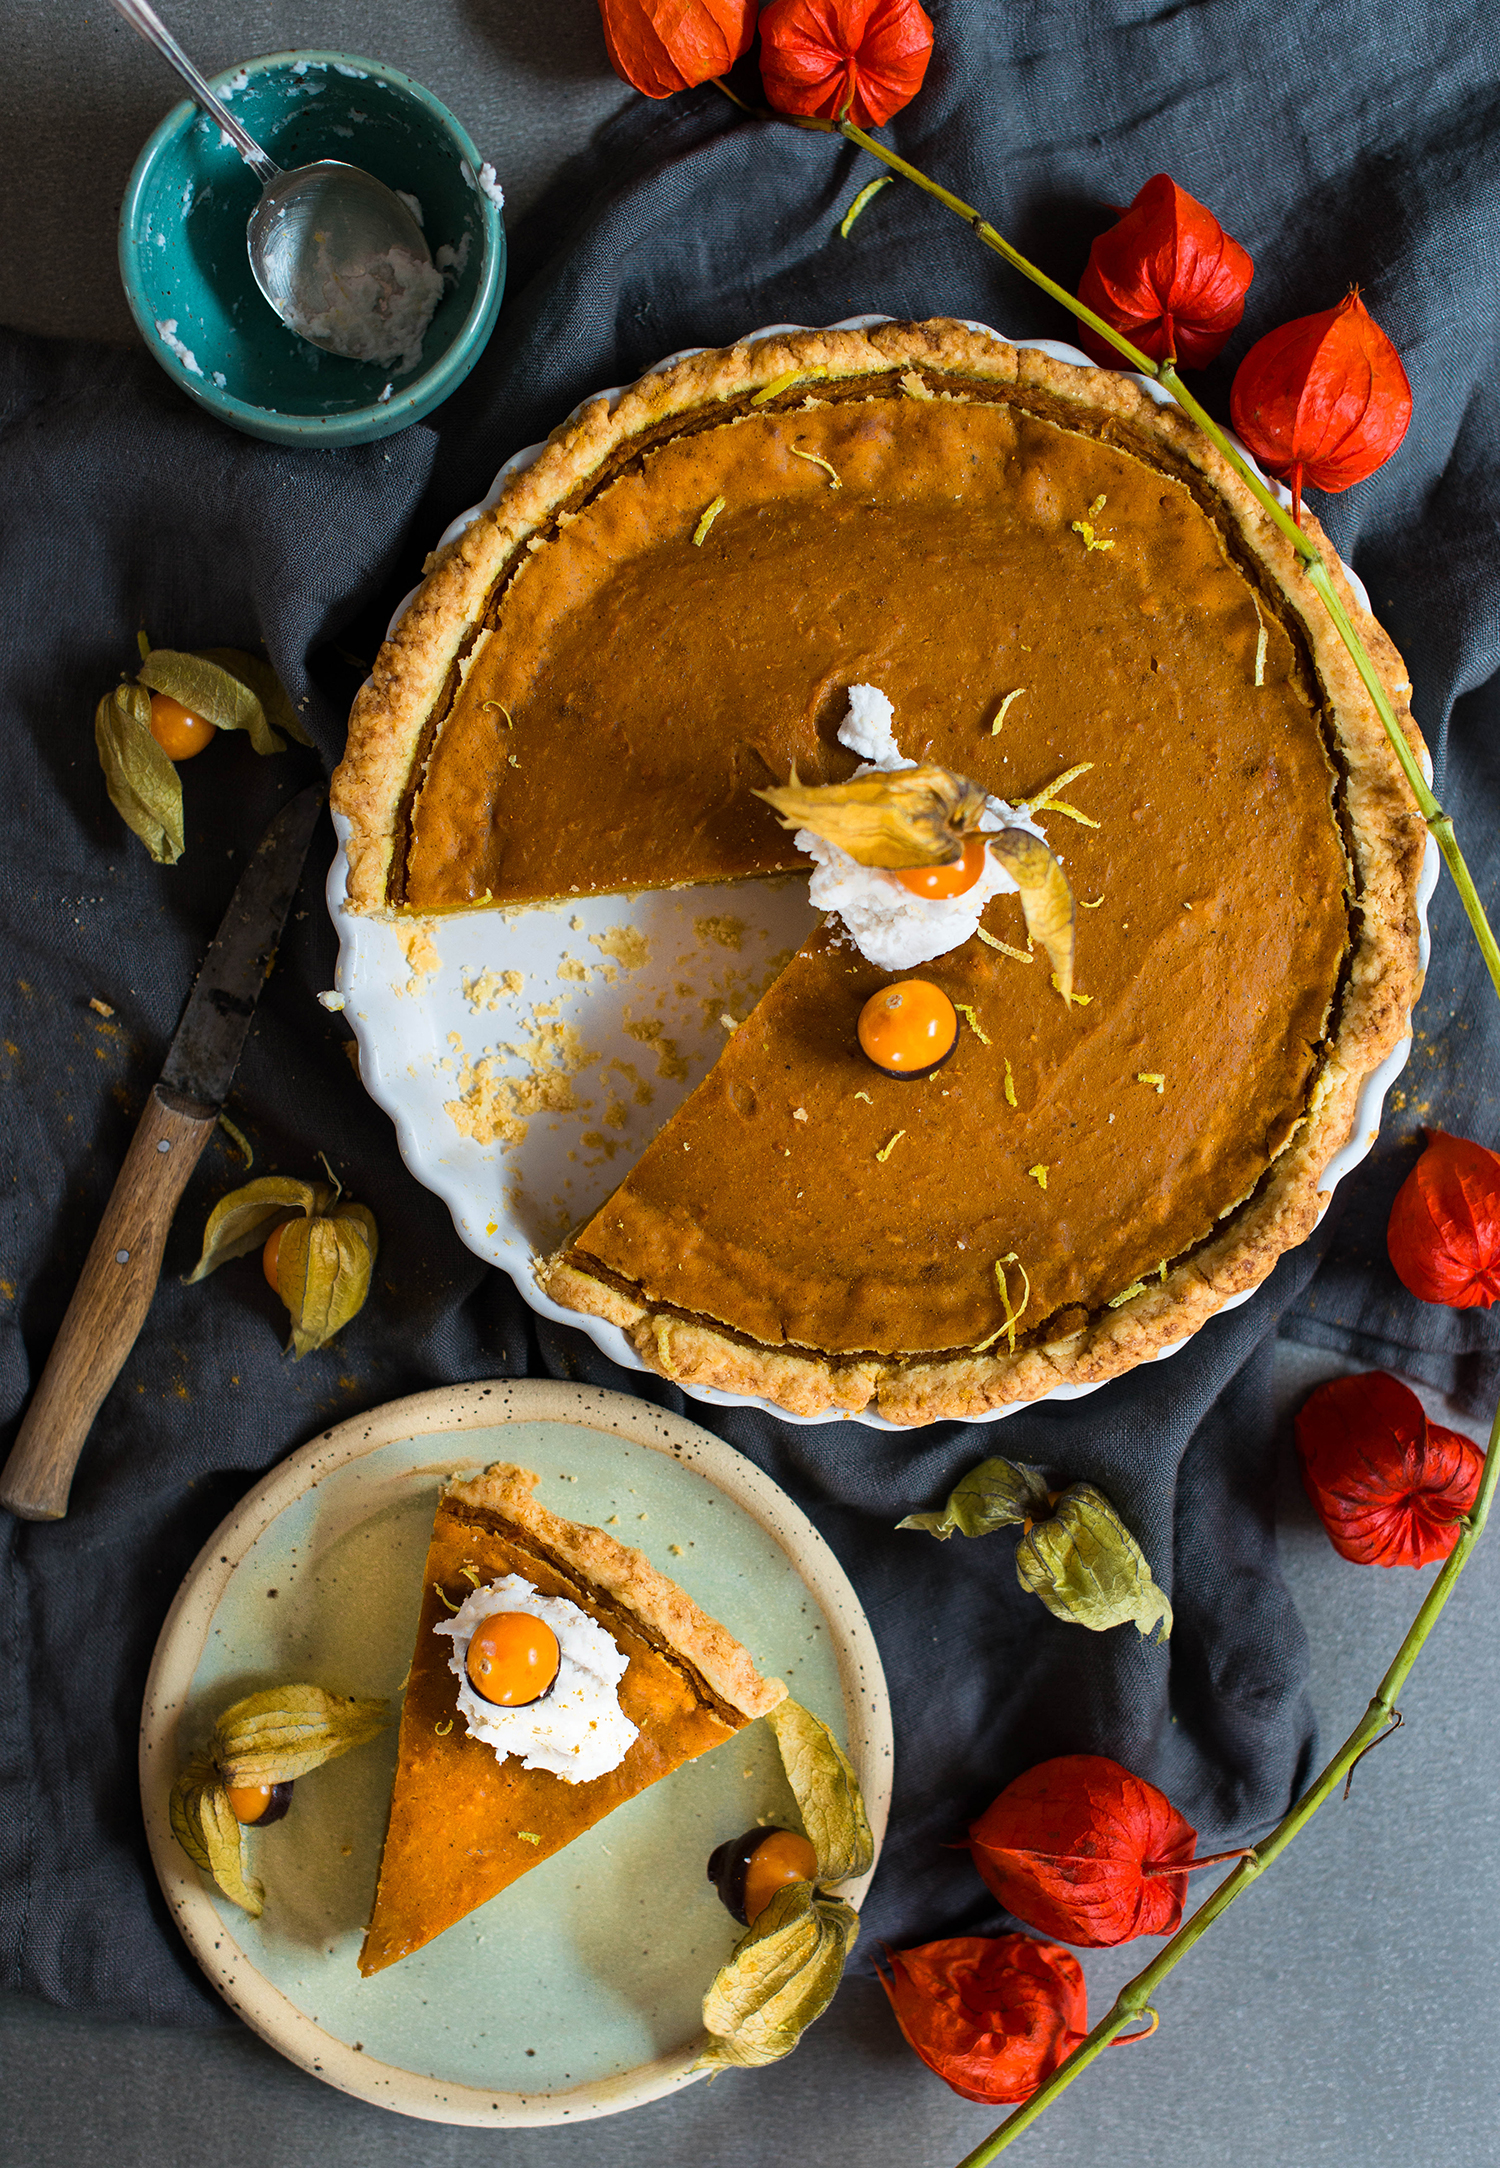 Vegan-pumpkin-pie-lea-lou-veganz-5